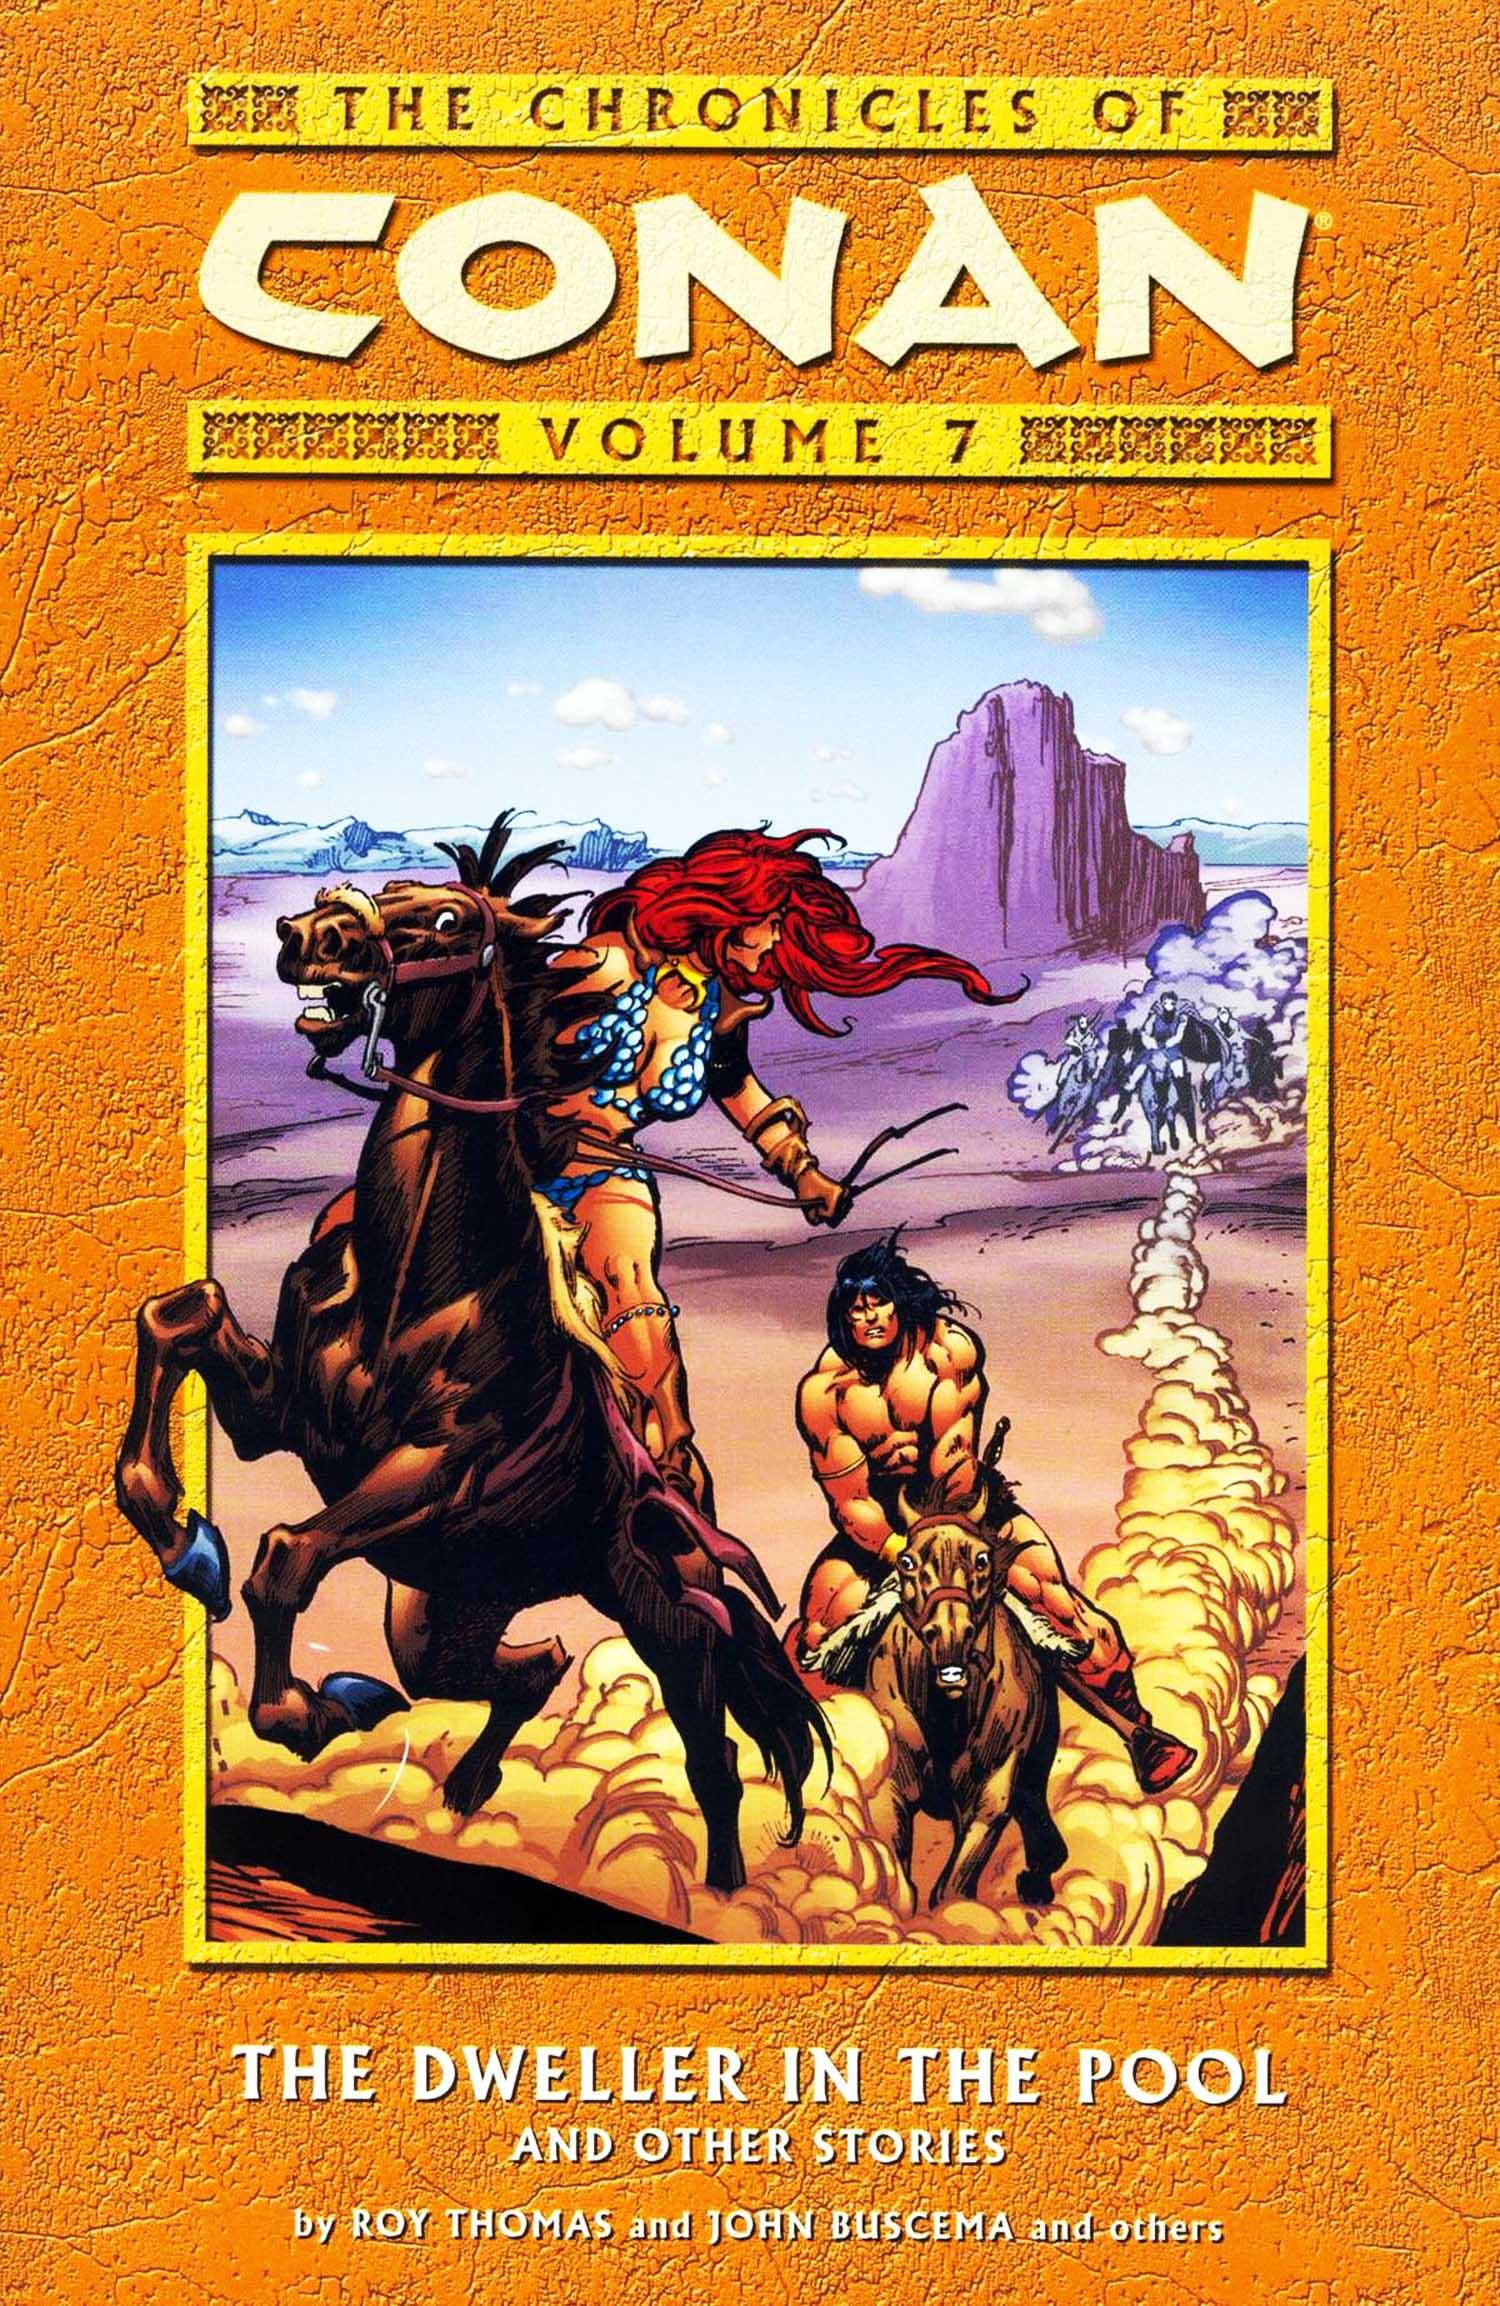 The Chronicles of Conan Volume 7